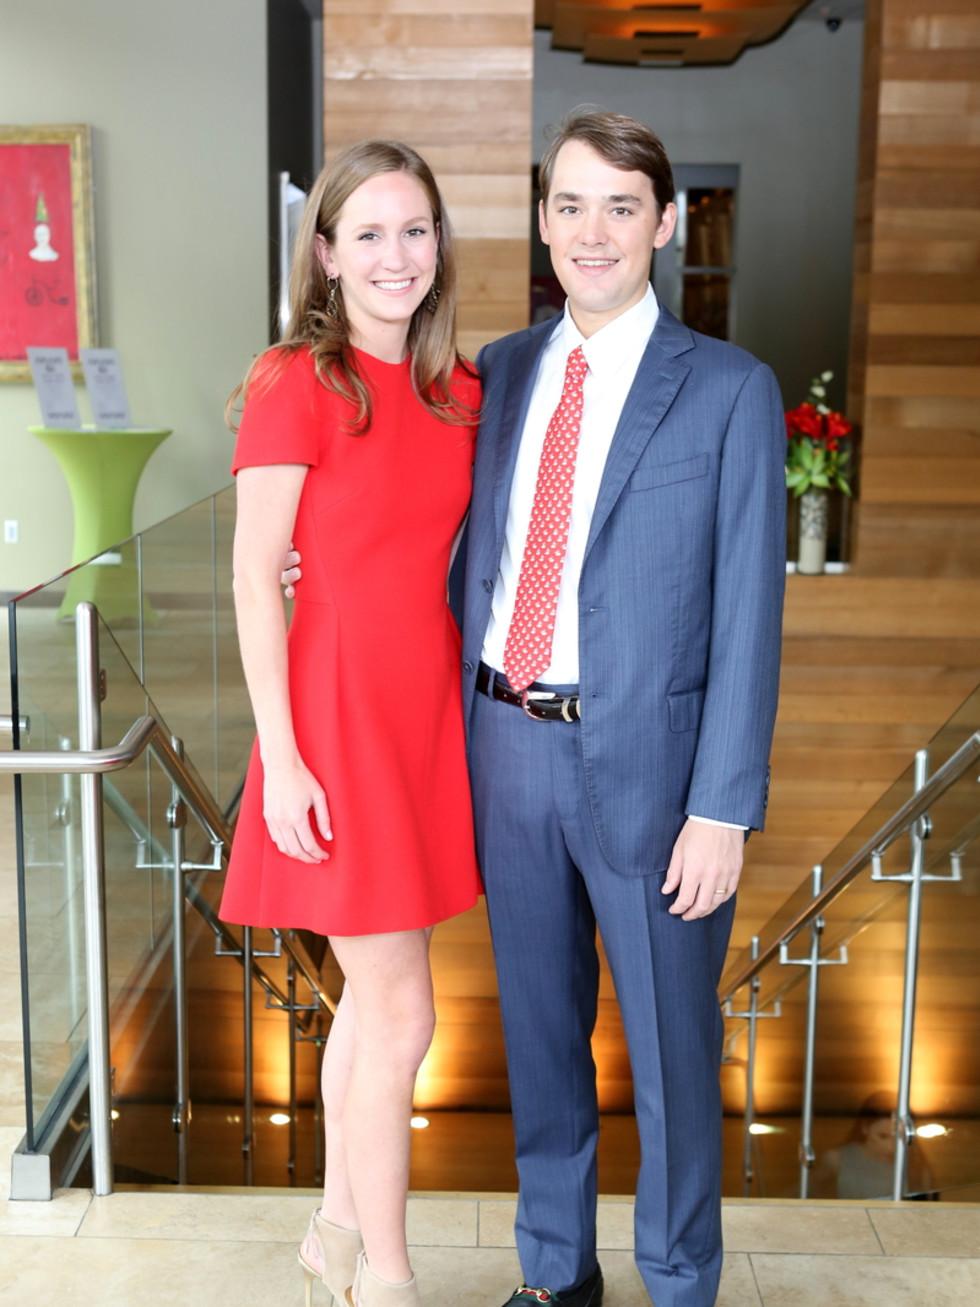 Houston Ballet Barre dinner, April 2016 Lilly Cullen, Harrison Cullen